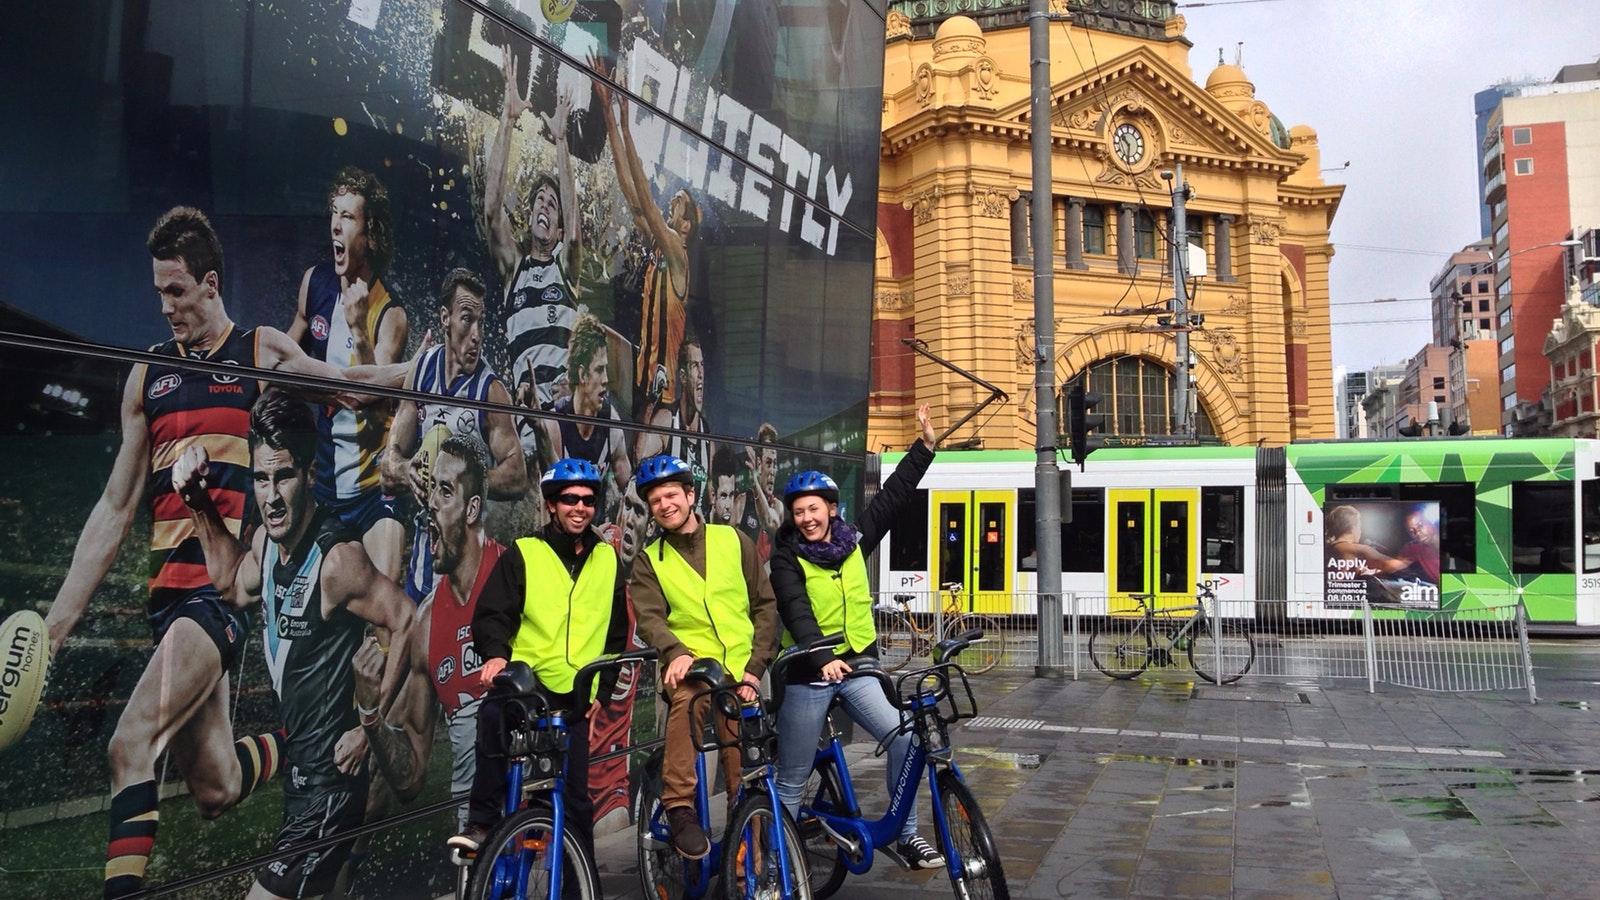 Melbourne by Bike tour